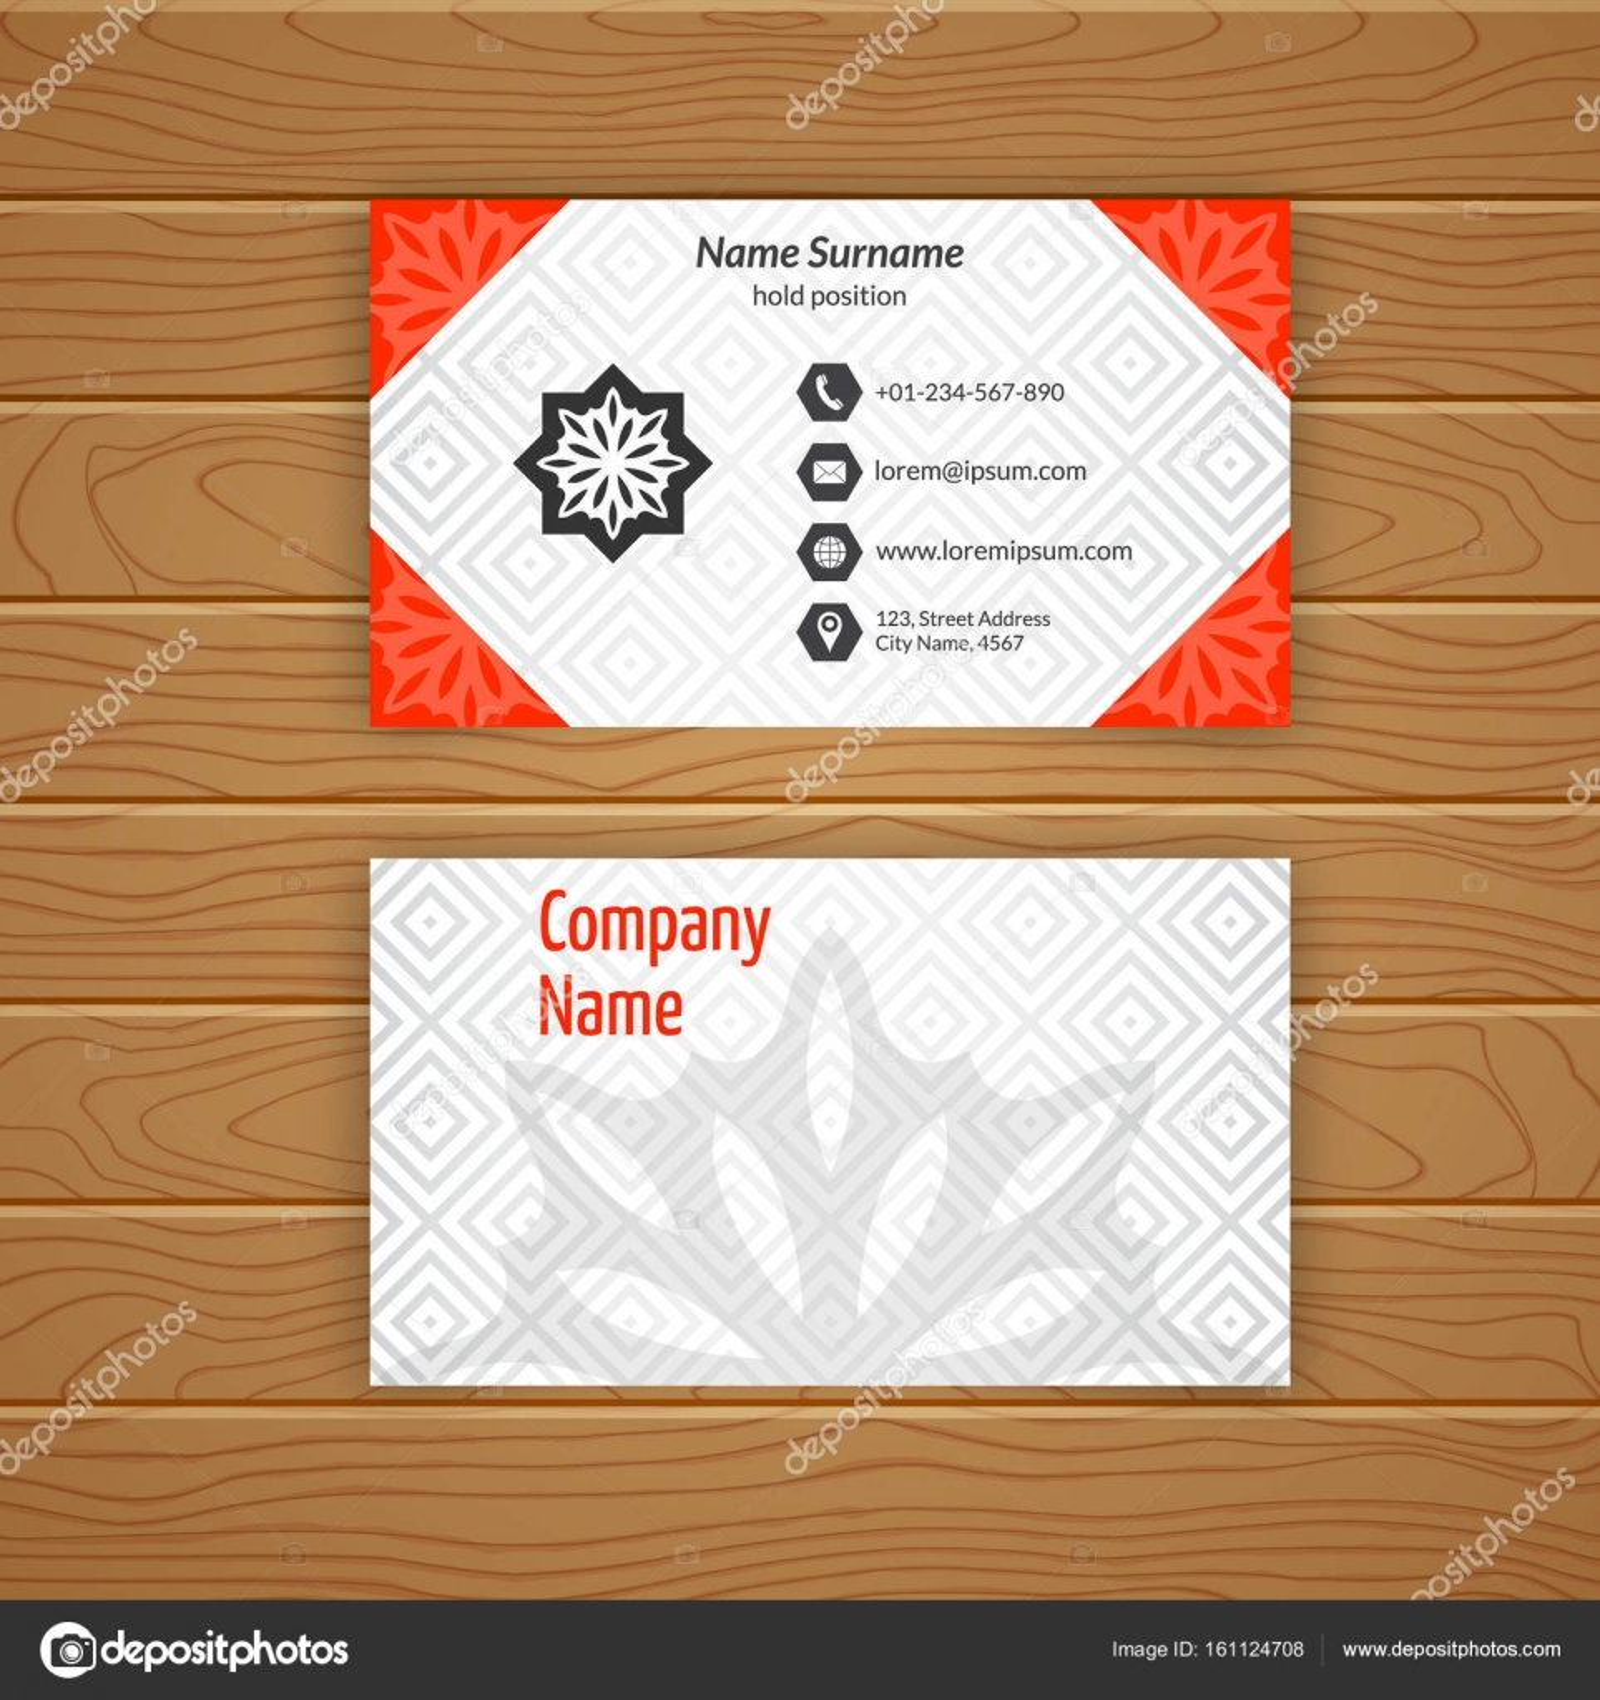 Business card blank template stock vector baretsky 161124708 business card blank template with textured background from diamond tiles minimal elegant vector design vector by baretsky friedricerecipe Choice Image